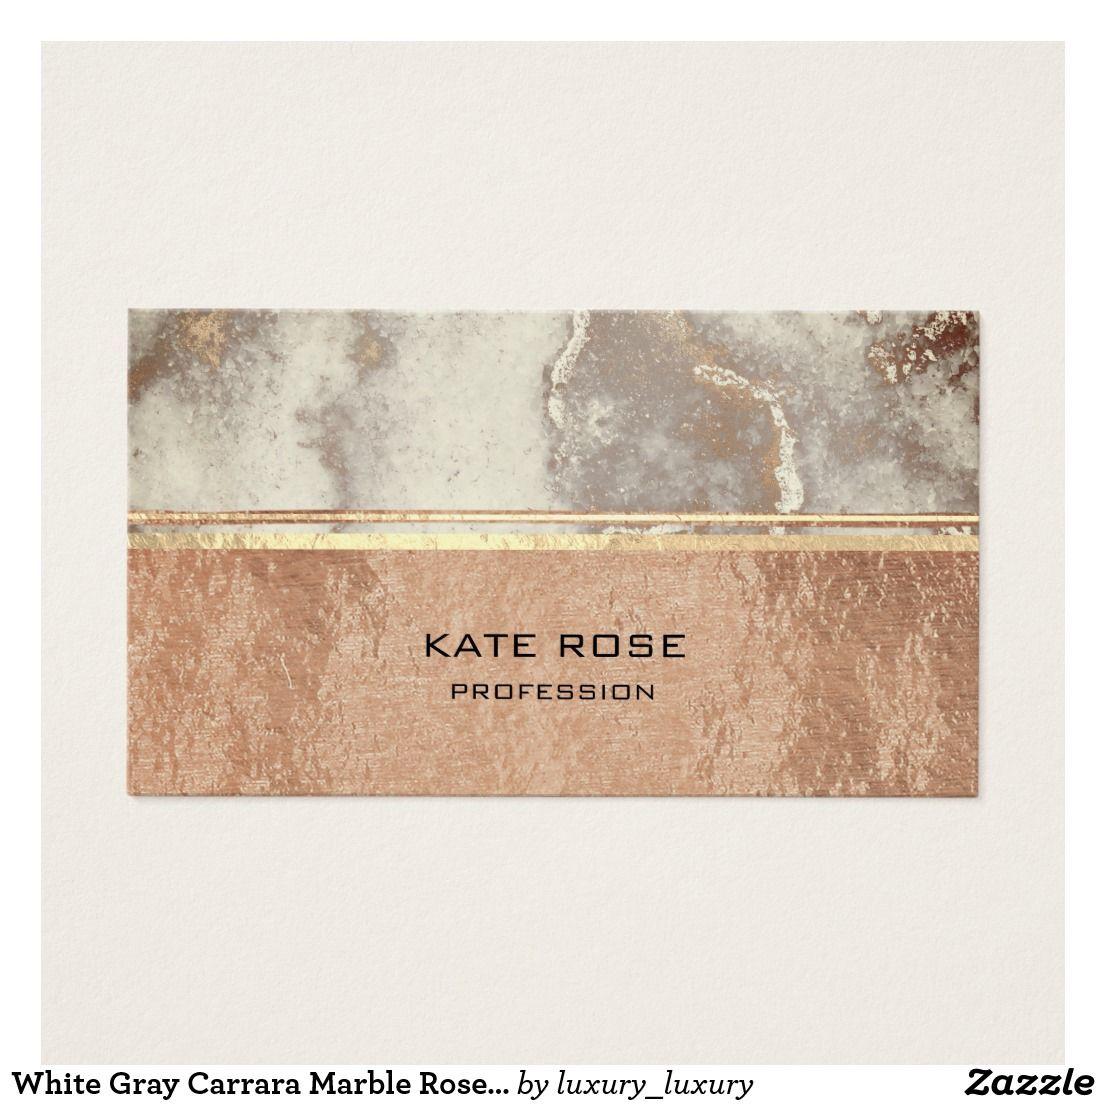 White gray carrara marble rose gold makeup copper business card white gray carrara marble rose gold makeup copper business card colourmoves Images